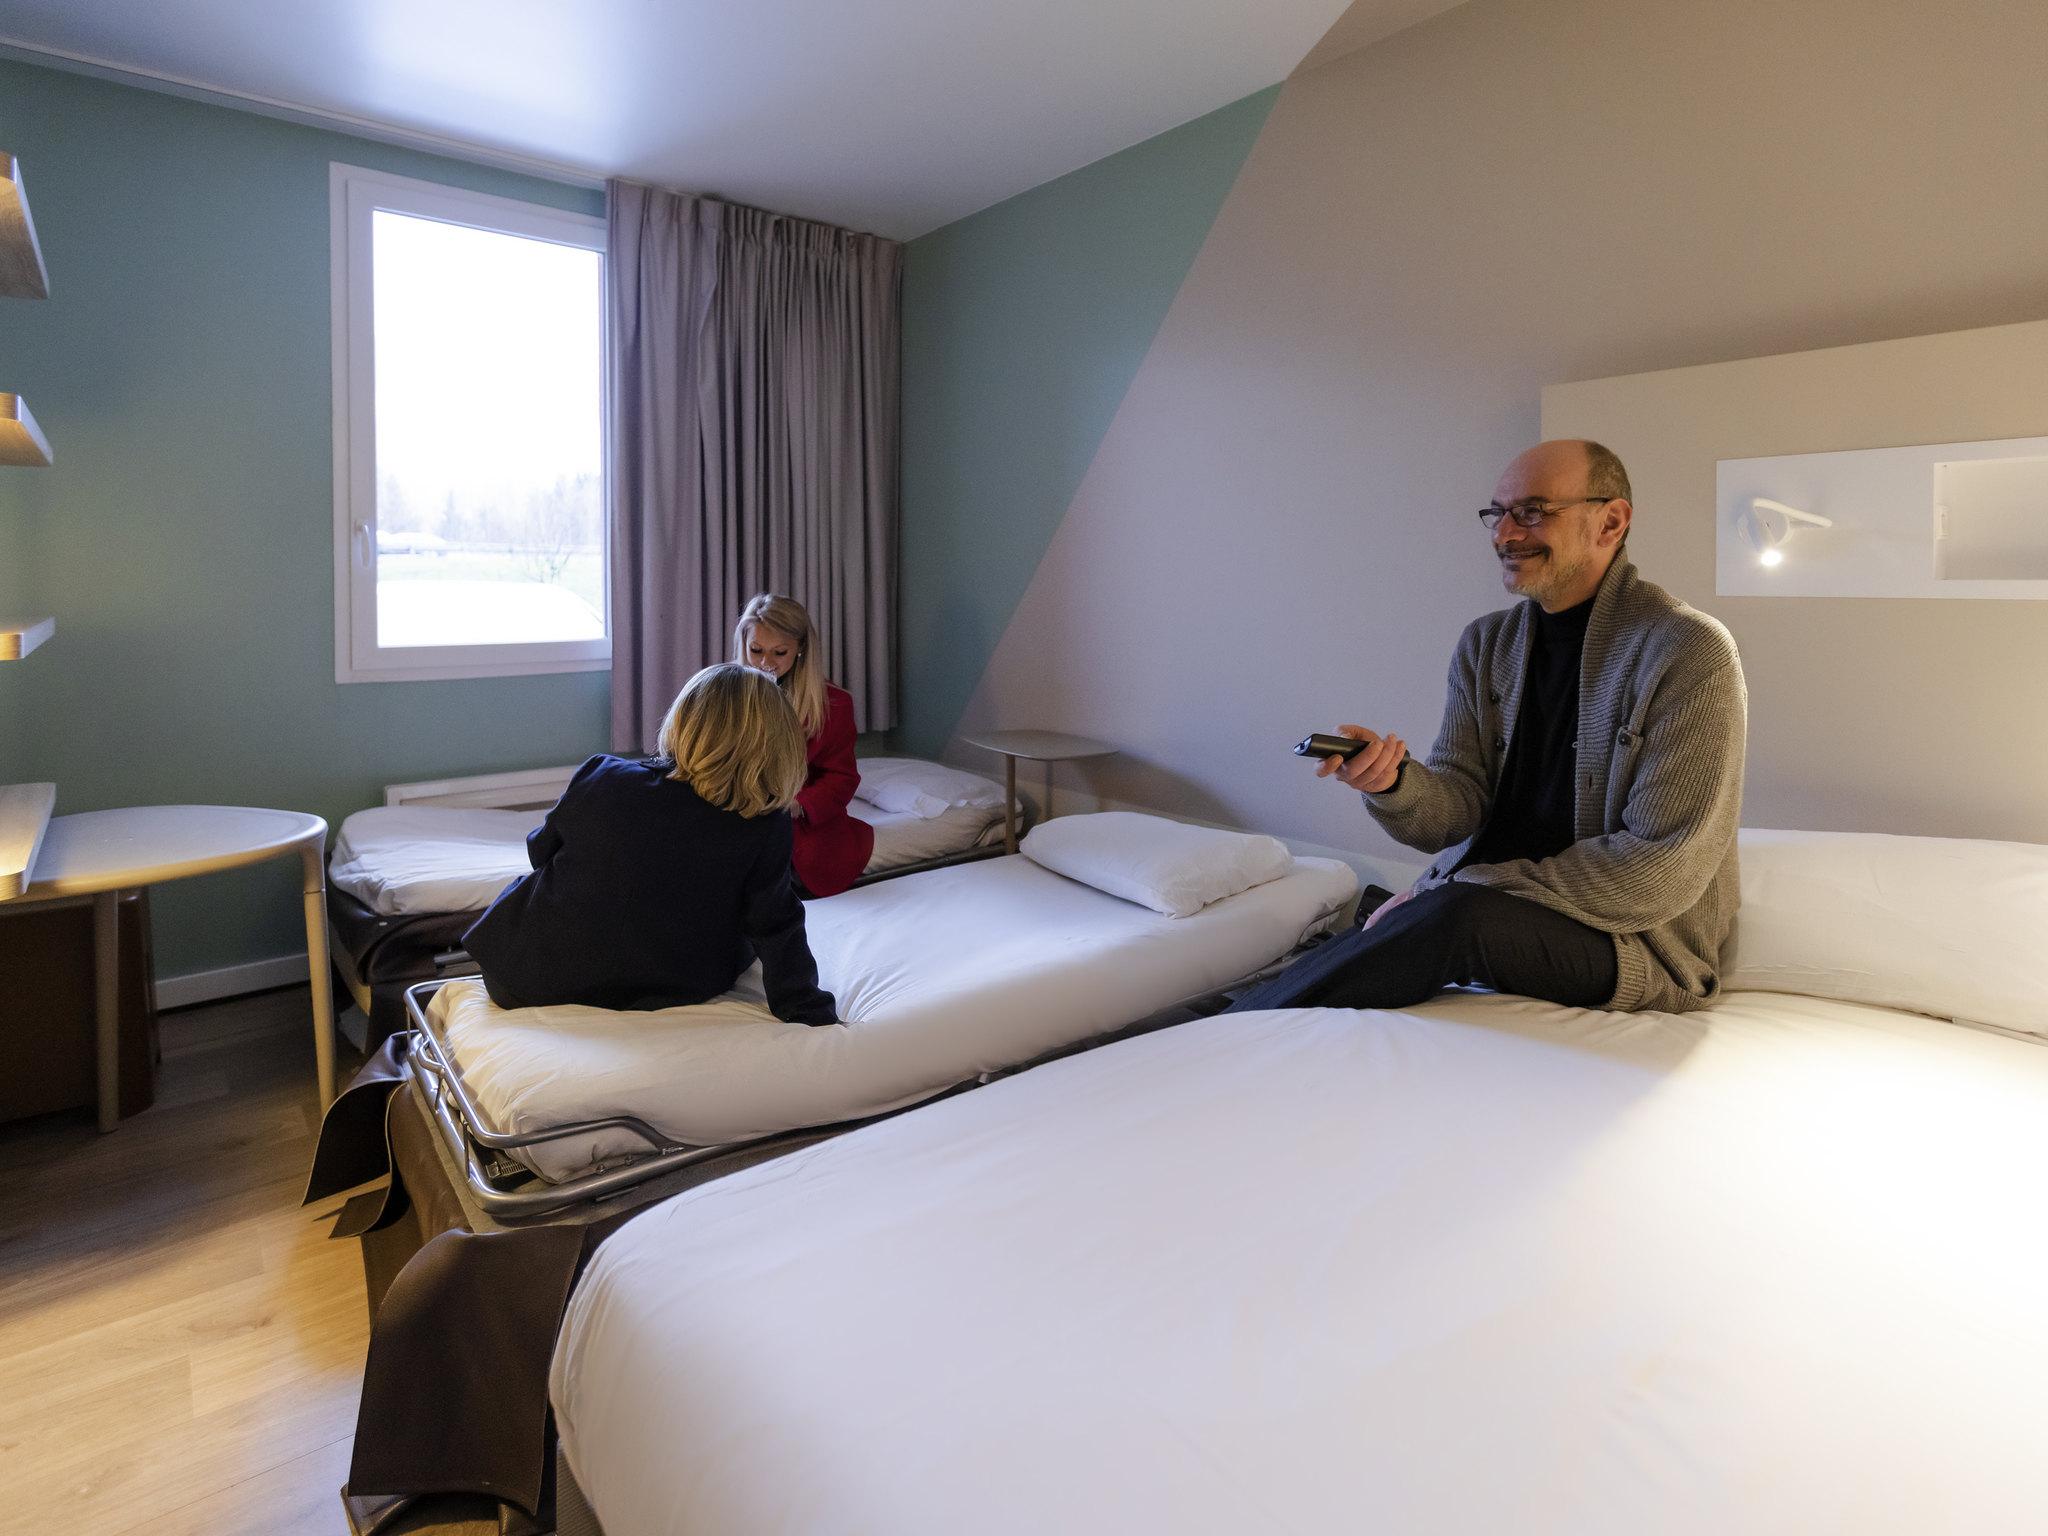 Hotel in GILLY SUR ISERE ibis bud Albertville